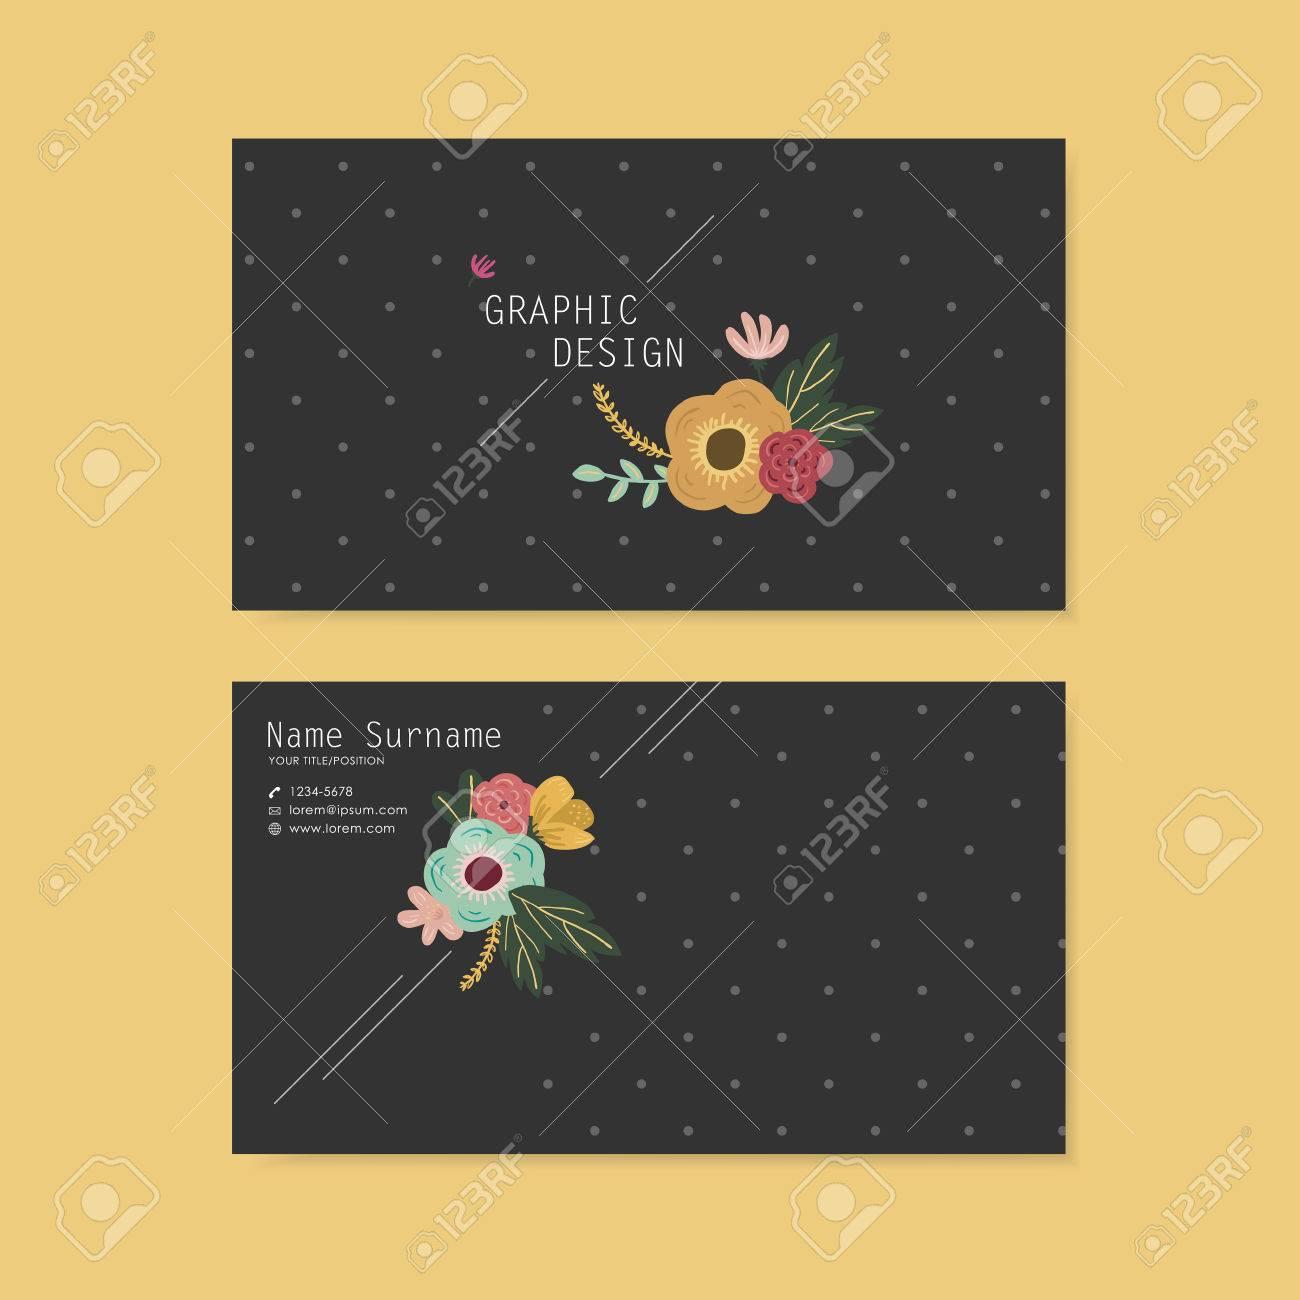 Lovely Business Card Design With Elegant Flower Element Over ...